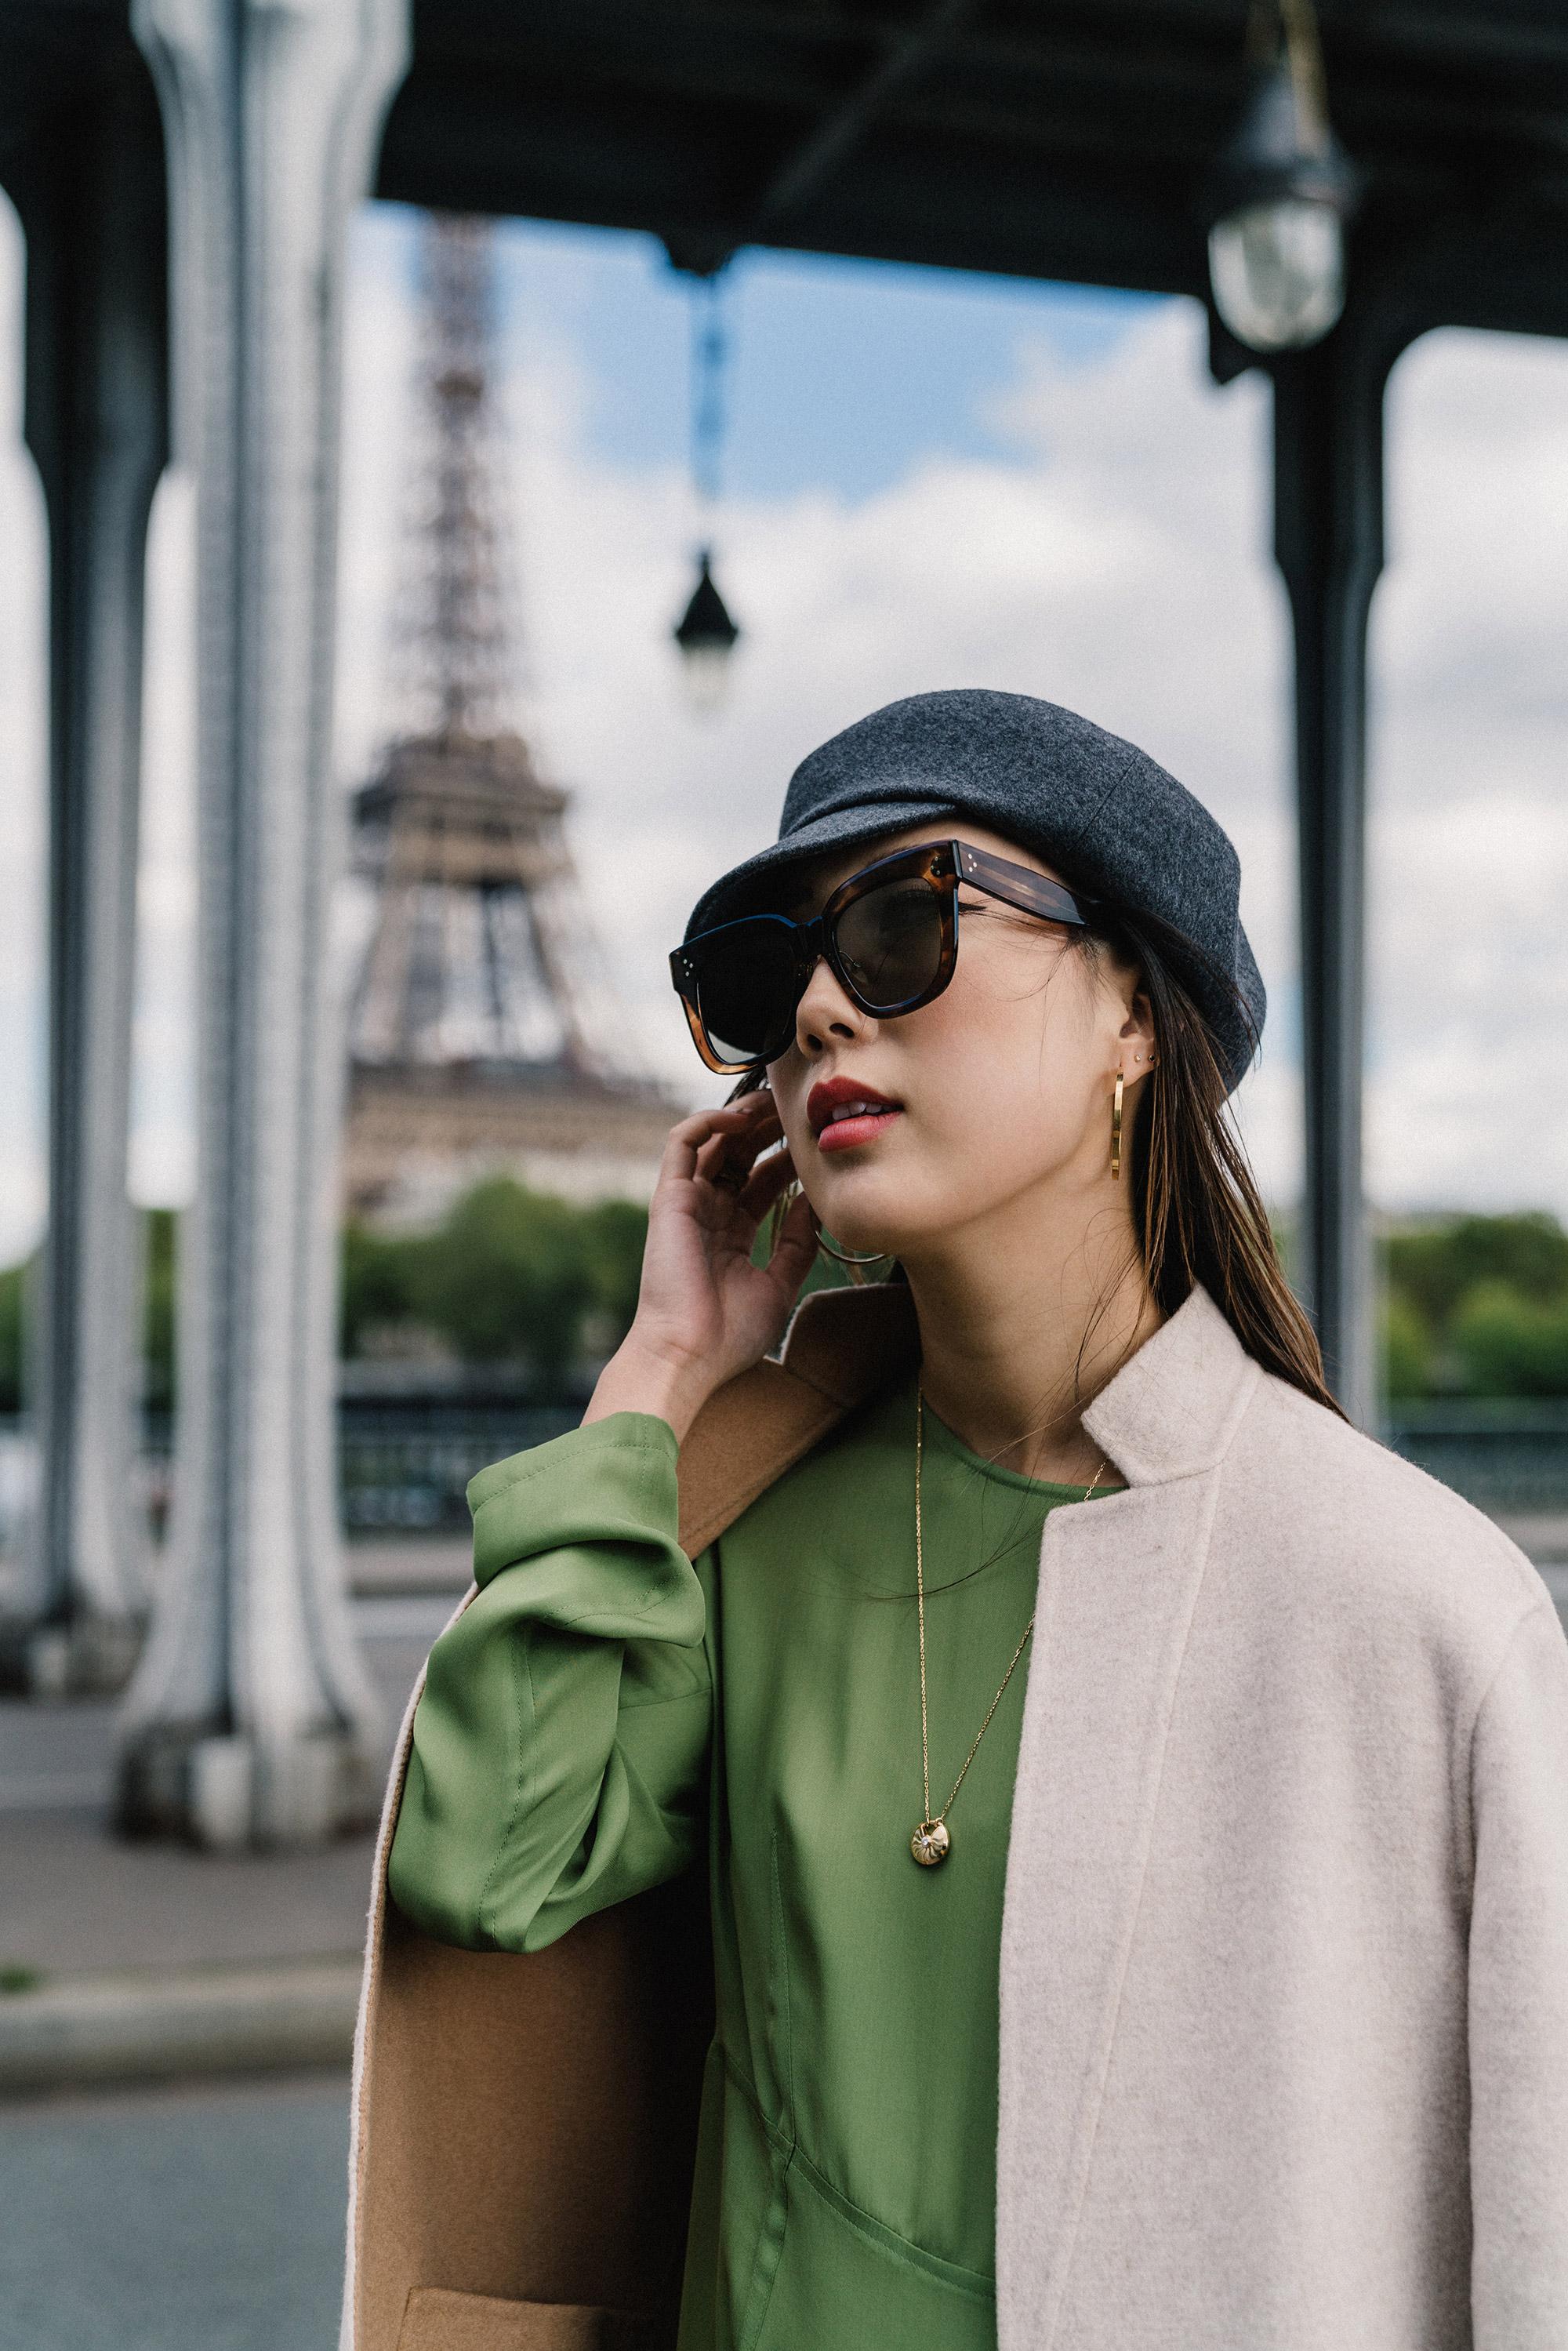 Theory Jacket, Yune Ho Dress, Hermes Hat, Céline Sunglasses,  Cartier Necklace ,  Vita Fede Earrings